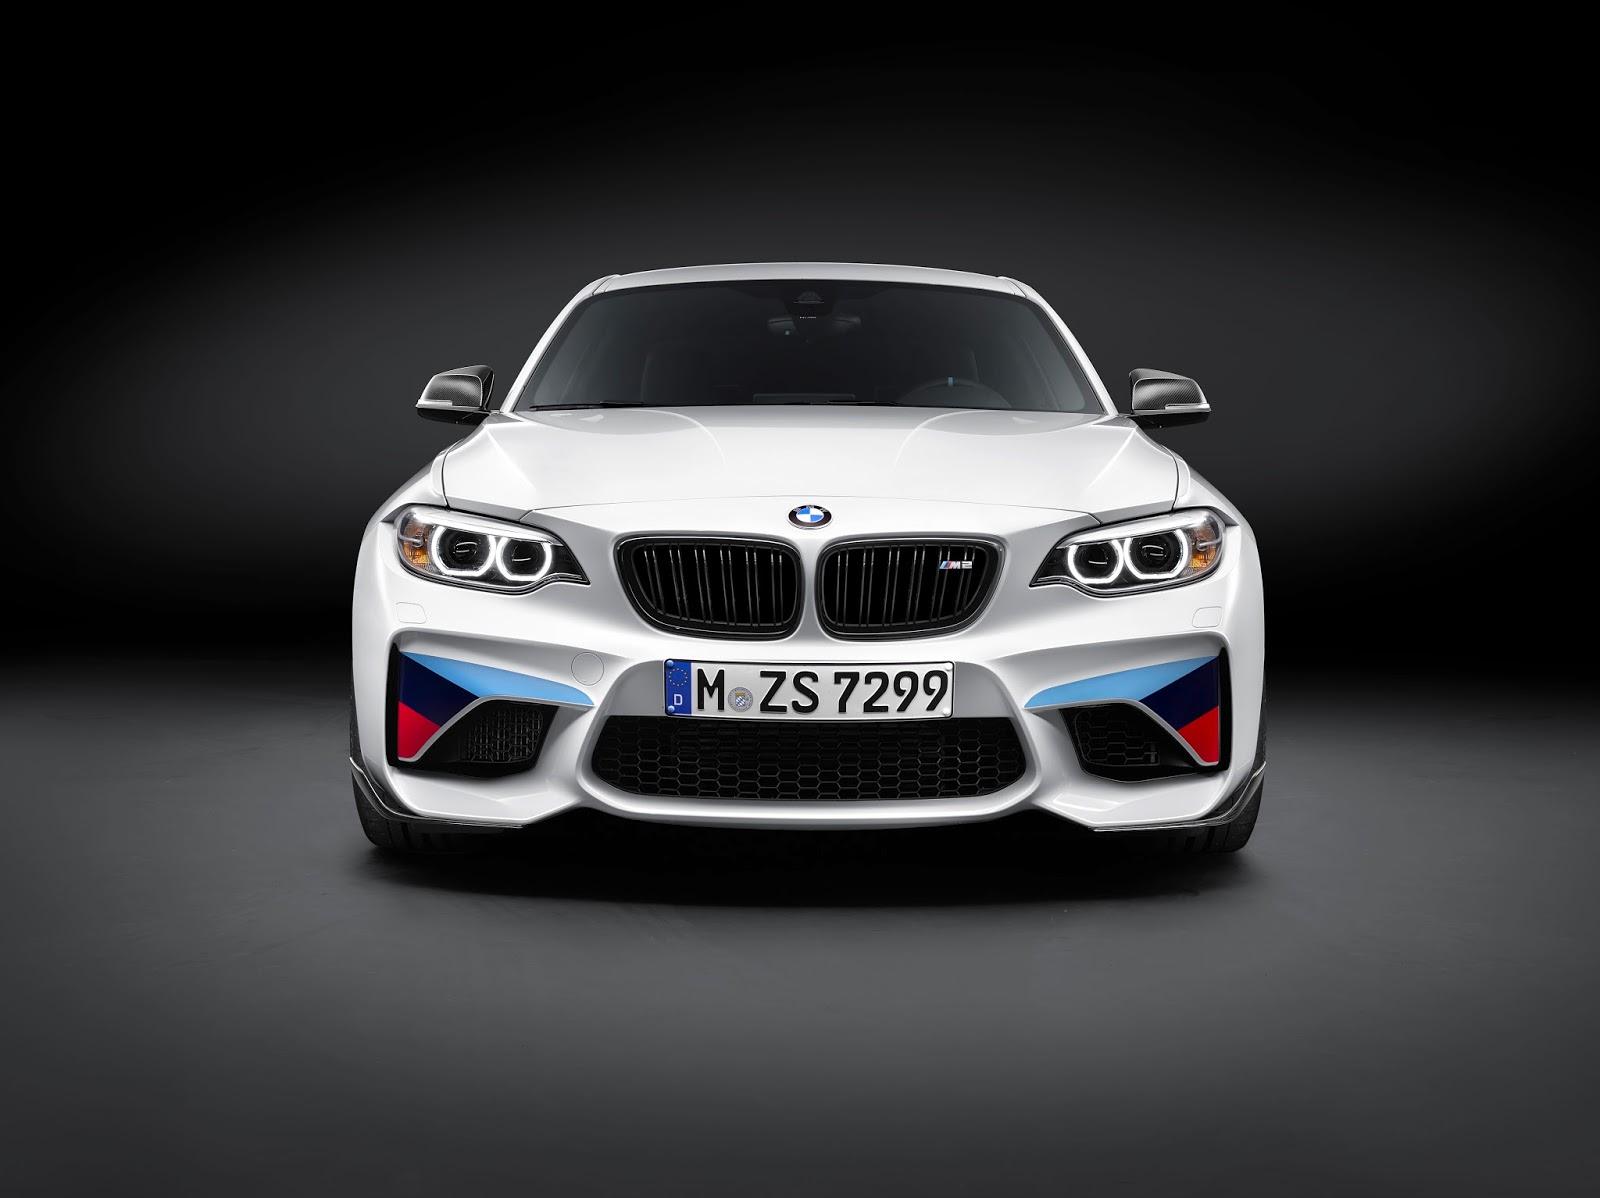 P90207895 highRes the new bmw m2 coupe Νέα Αξεσουάρ M Performance για τη νέα BMW M2 Coupé. BMW, BMW M2, BMW M2 Coupé, Αξεσουάρ